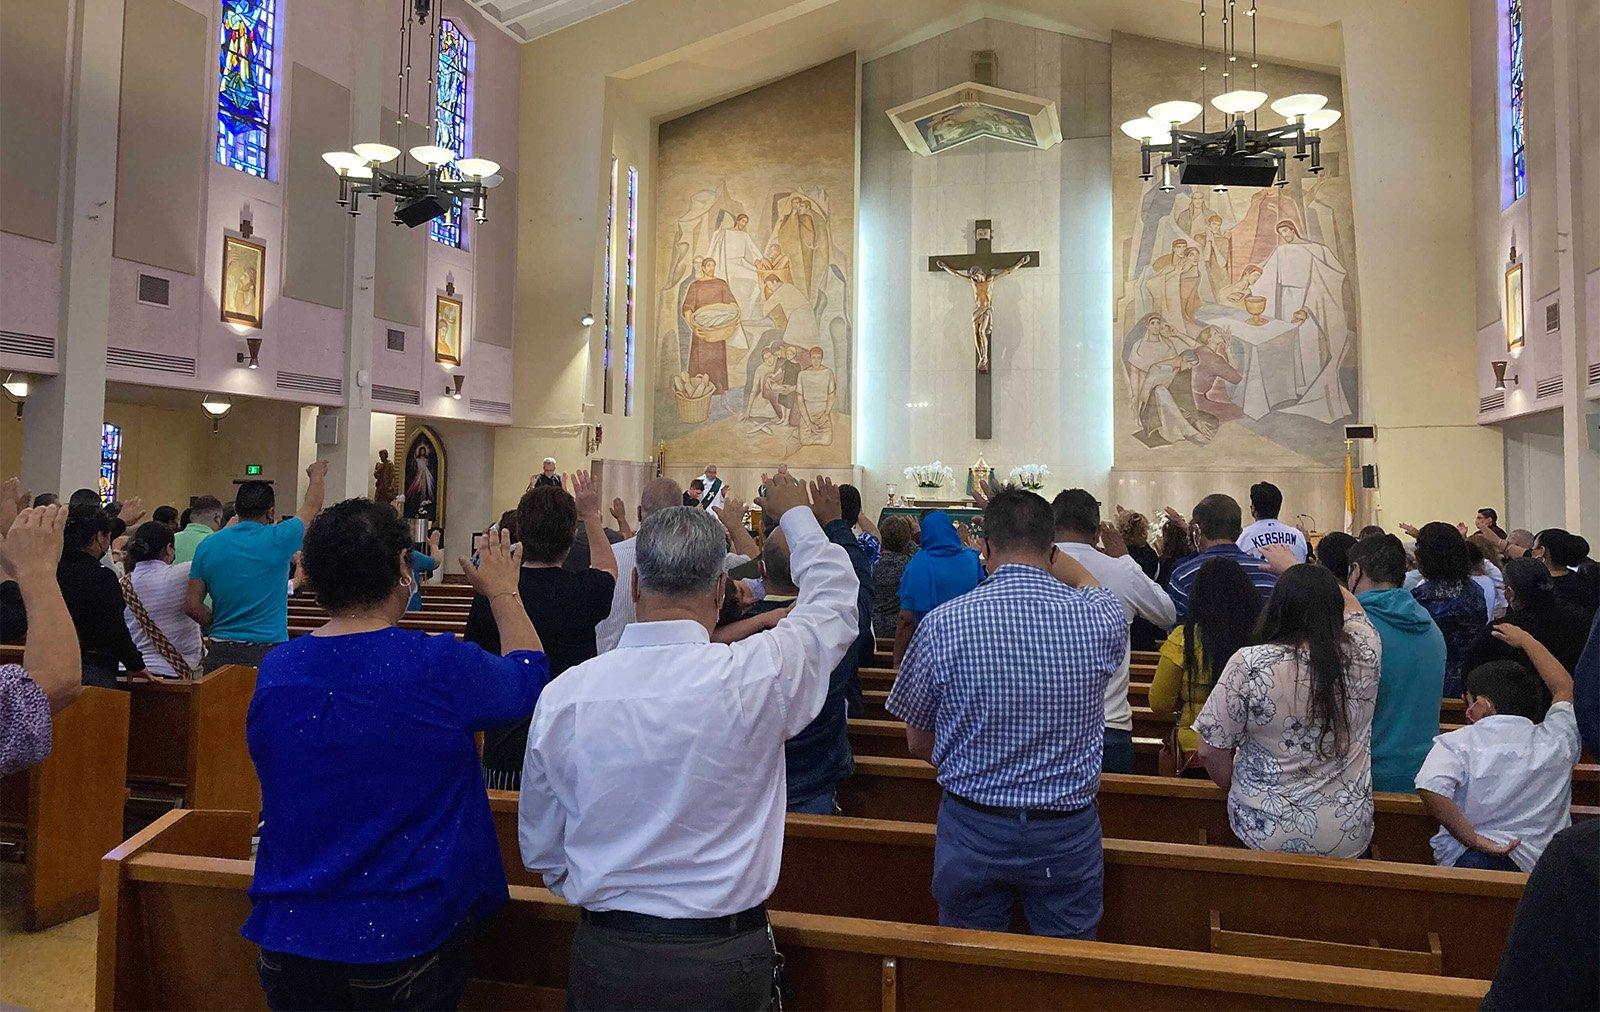 St. Anthony Catholic Church parishioners send birthday blessings for Father Matt Wheeler, Sunday, June 20, 2021, in San Gabriel, California. RNS phot by Alejandra Molina